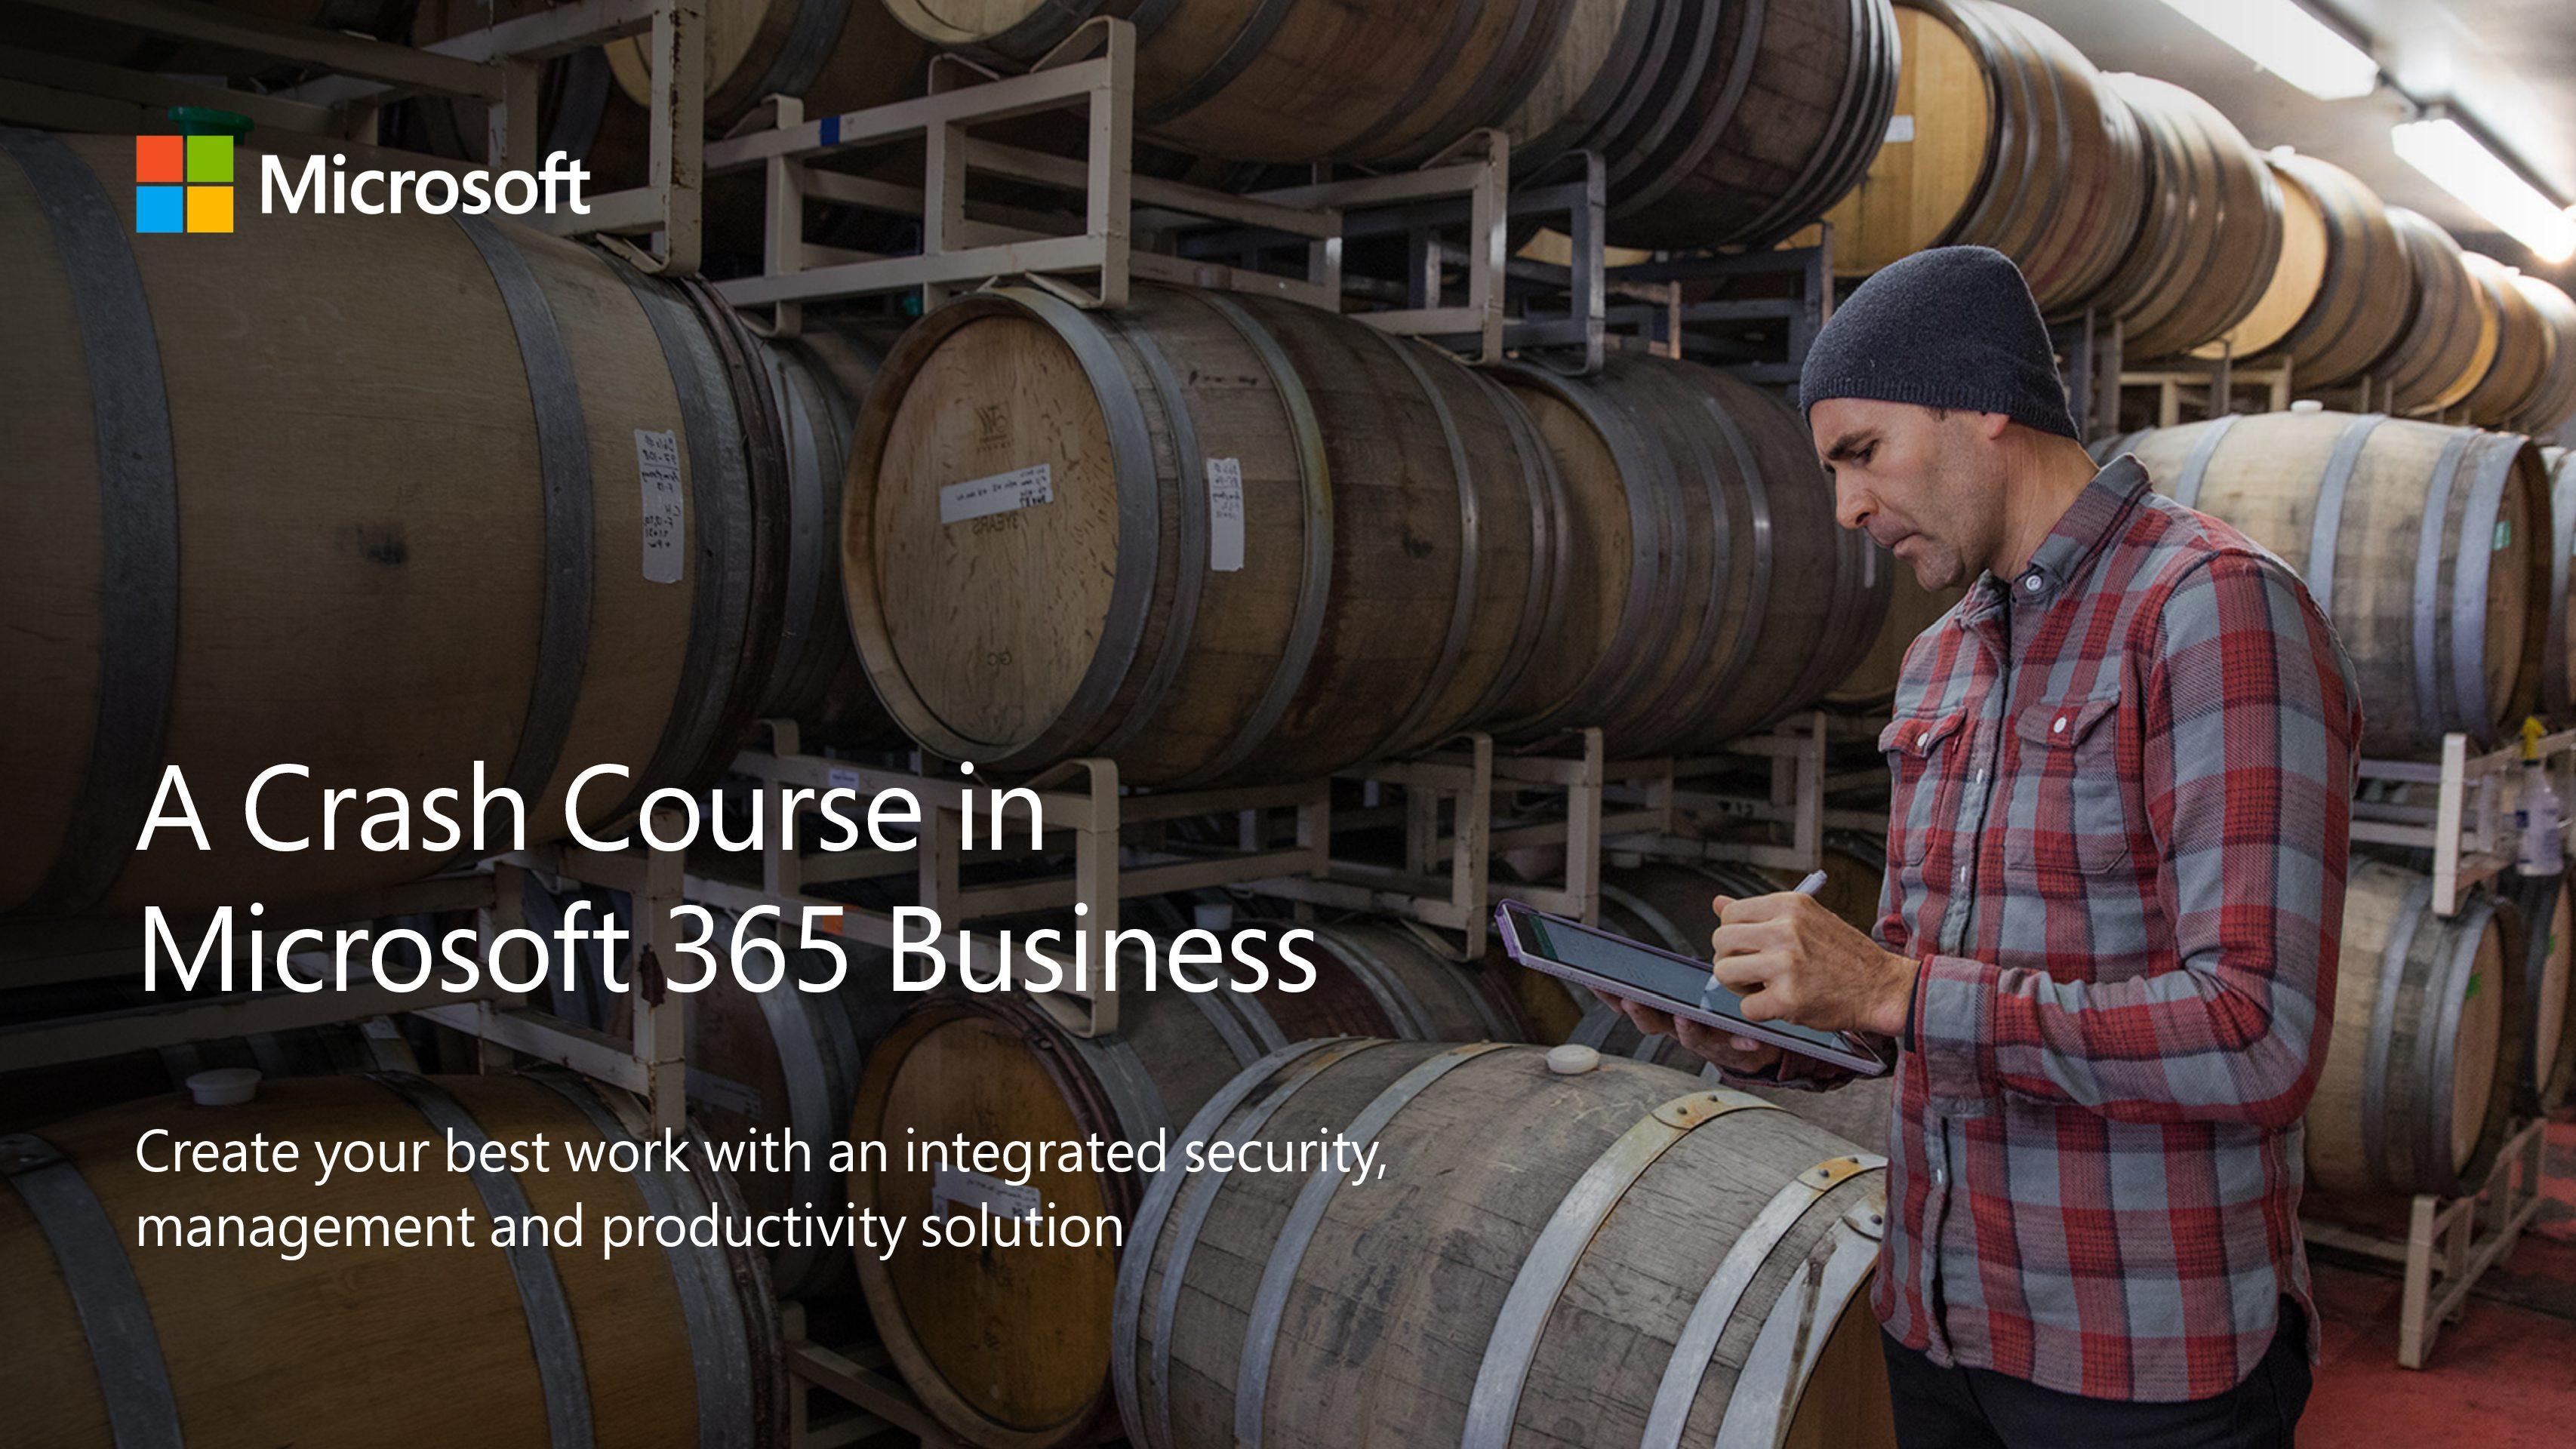 Crash Course in Microsoft 365 Business